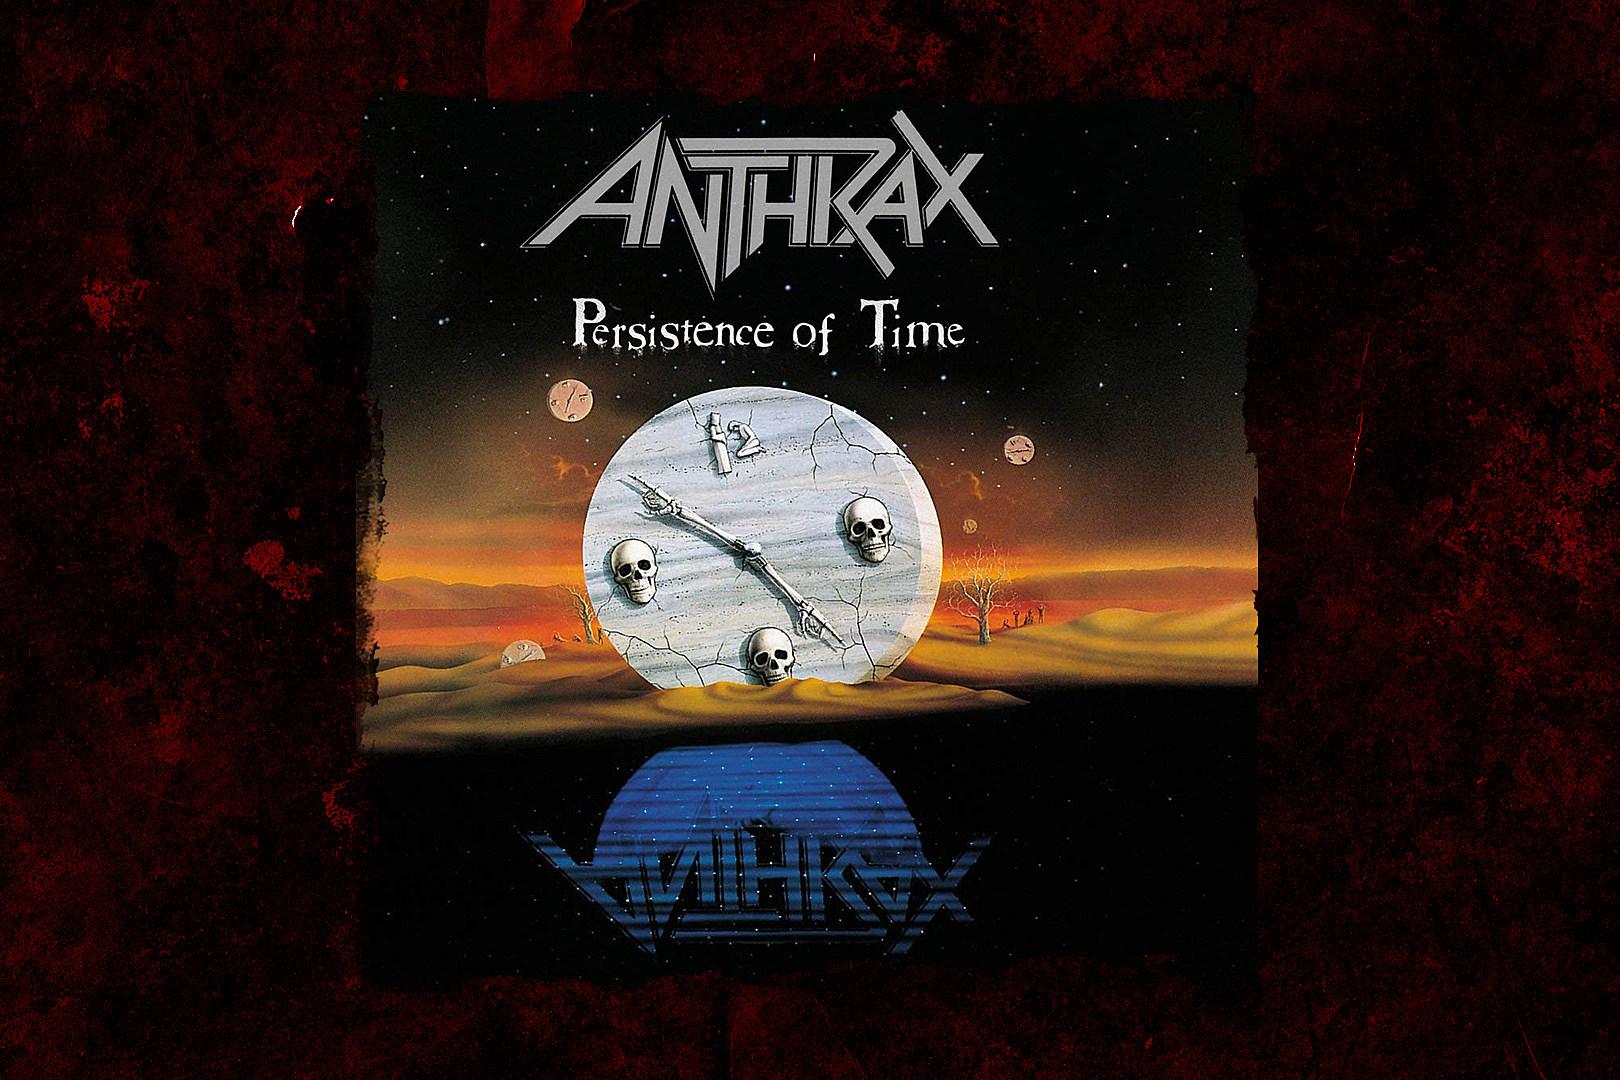 THE BAIXAR ANTHRAX BIG SLAYER DVD MEGADETH METALLICA FOUR